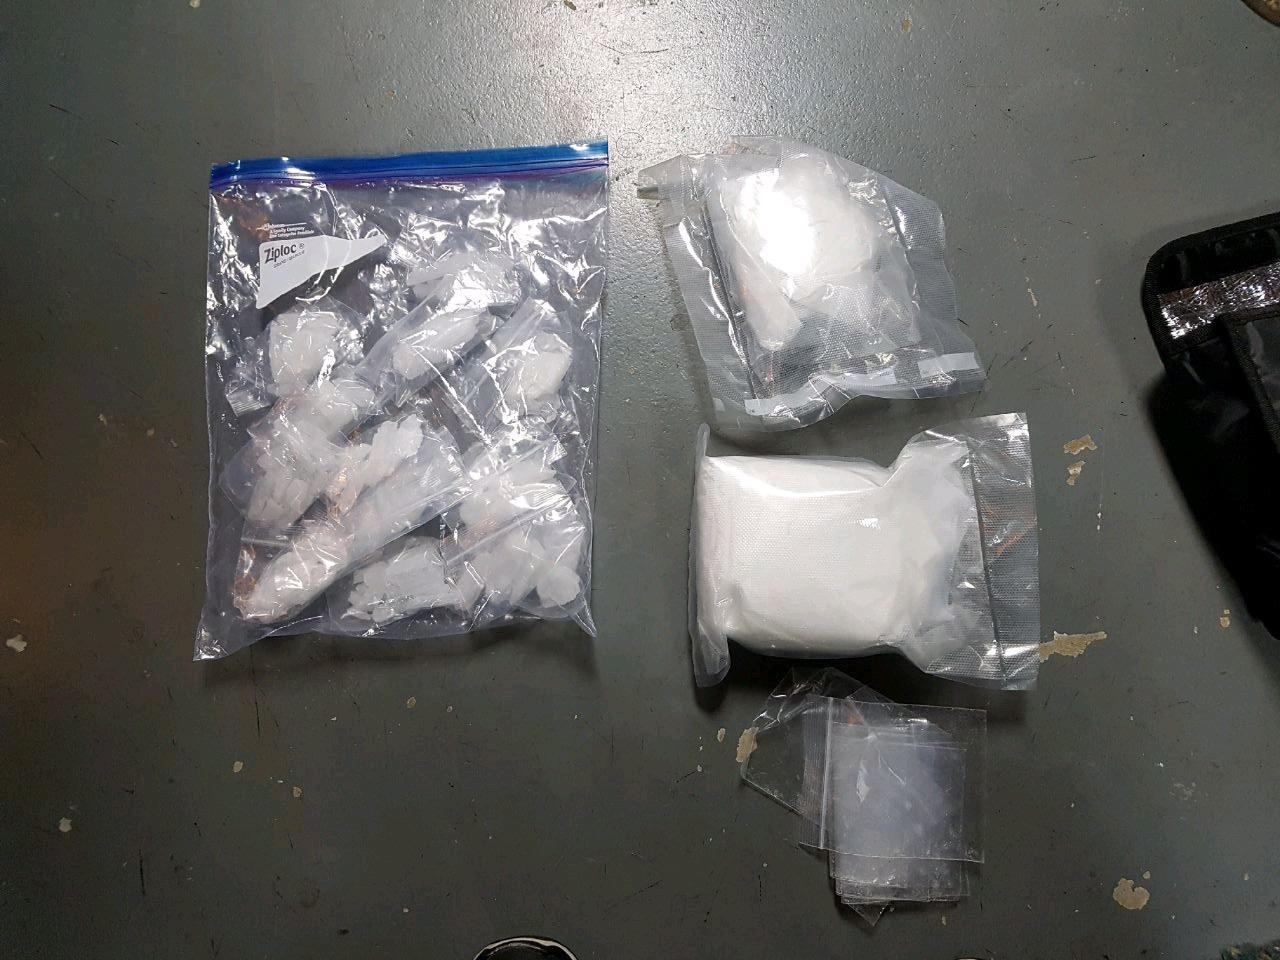 drugseizureoct1